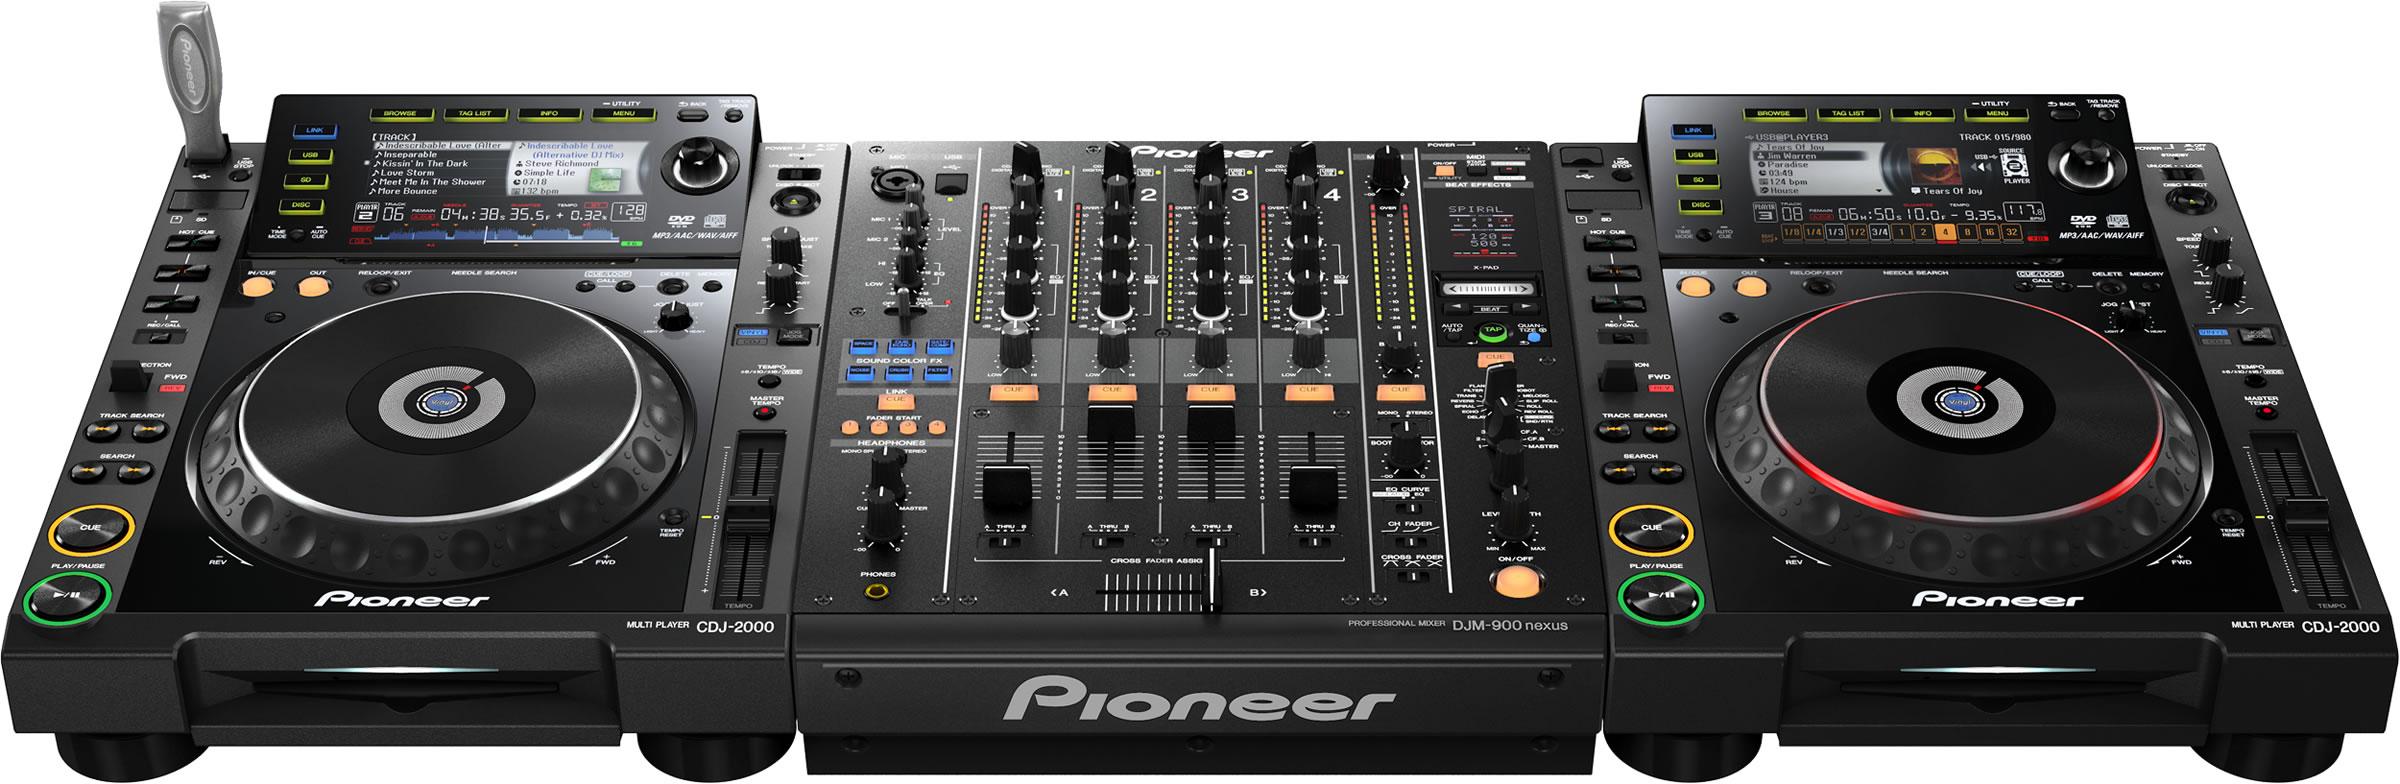 pioneer nexus the new djm 900 dj techtools. Black Bedroom Furniture Sets. Home Design Ideas